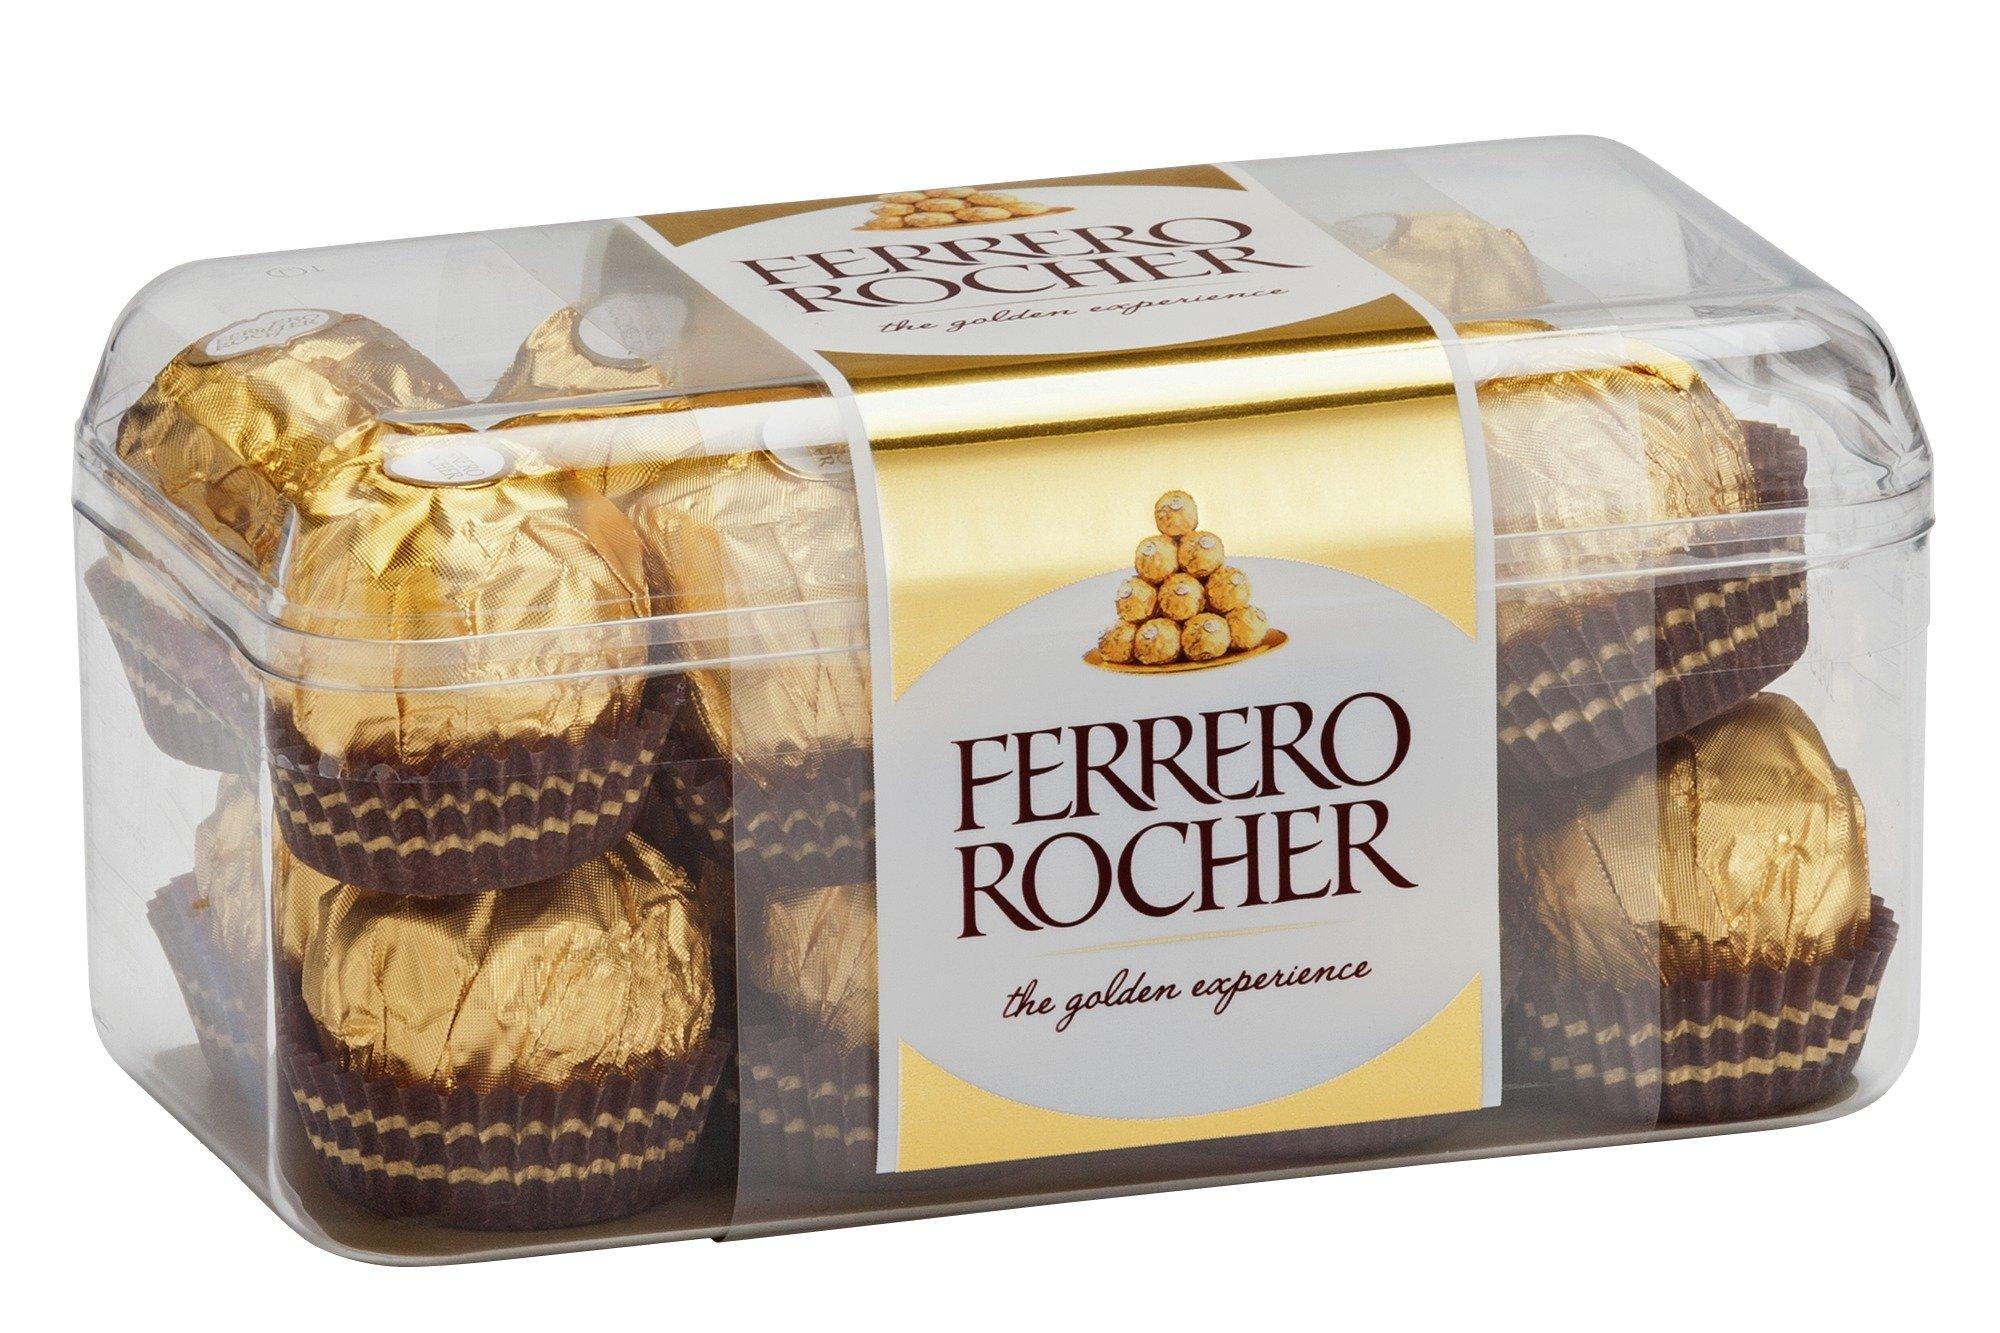 Image of Ferrero Rocher 16 Piece Boxed Chocolate.